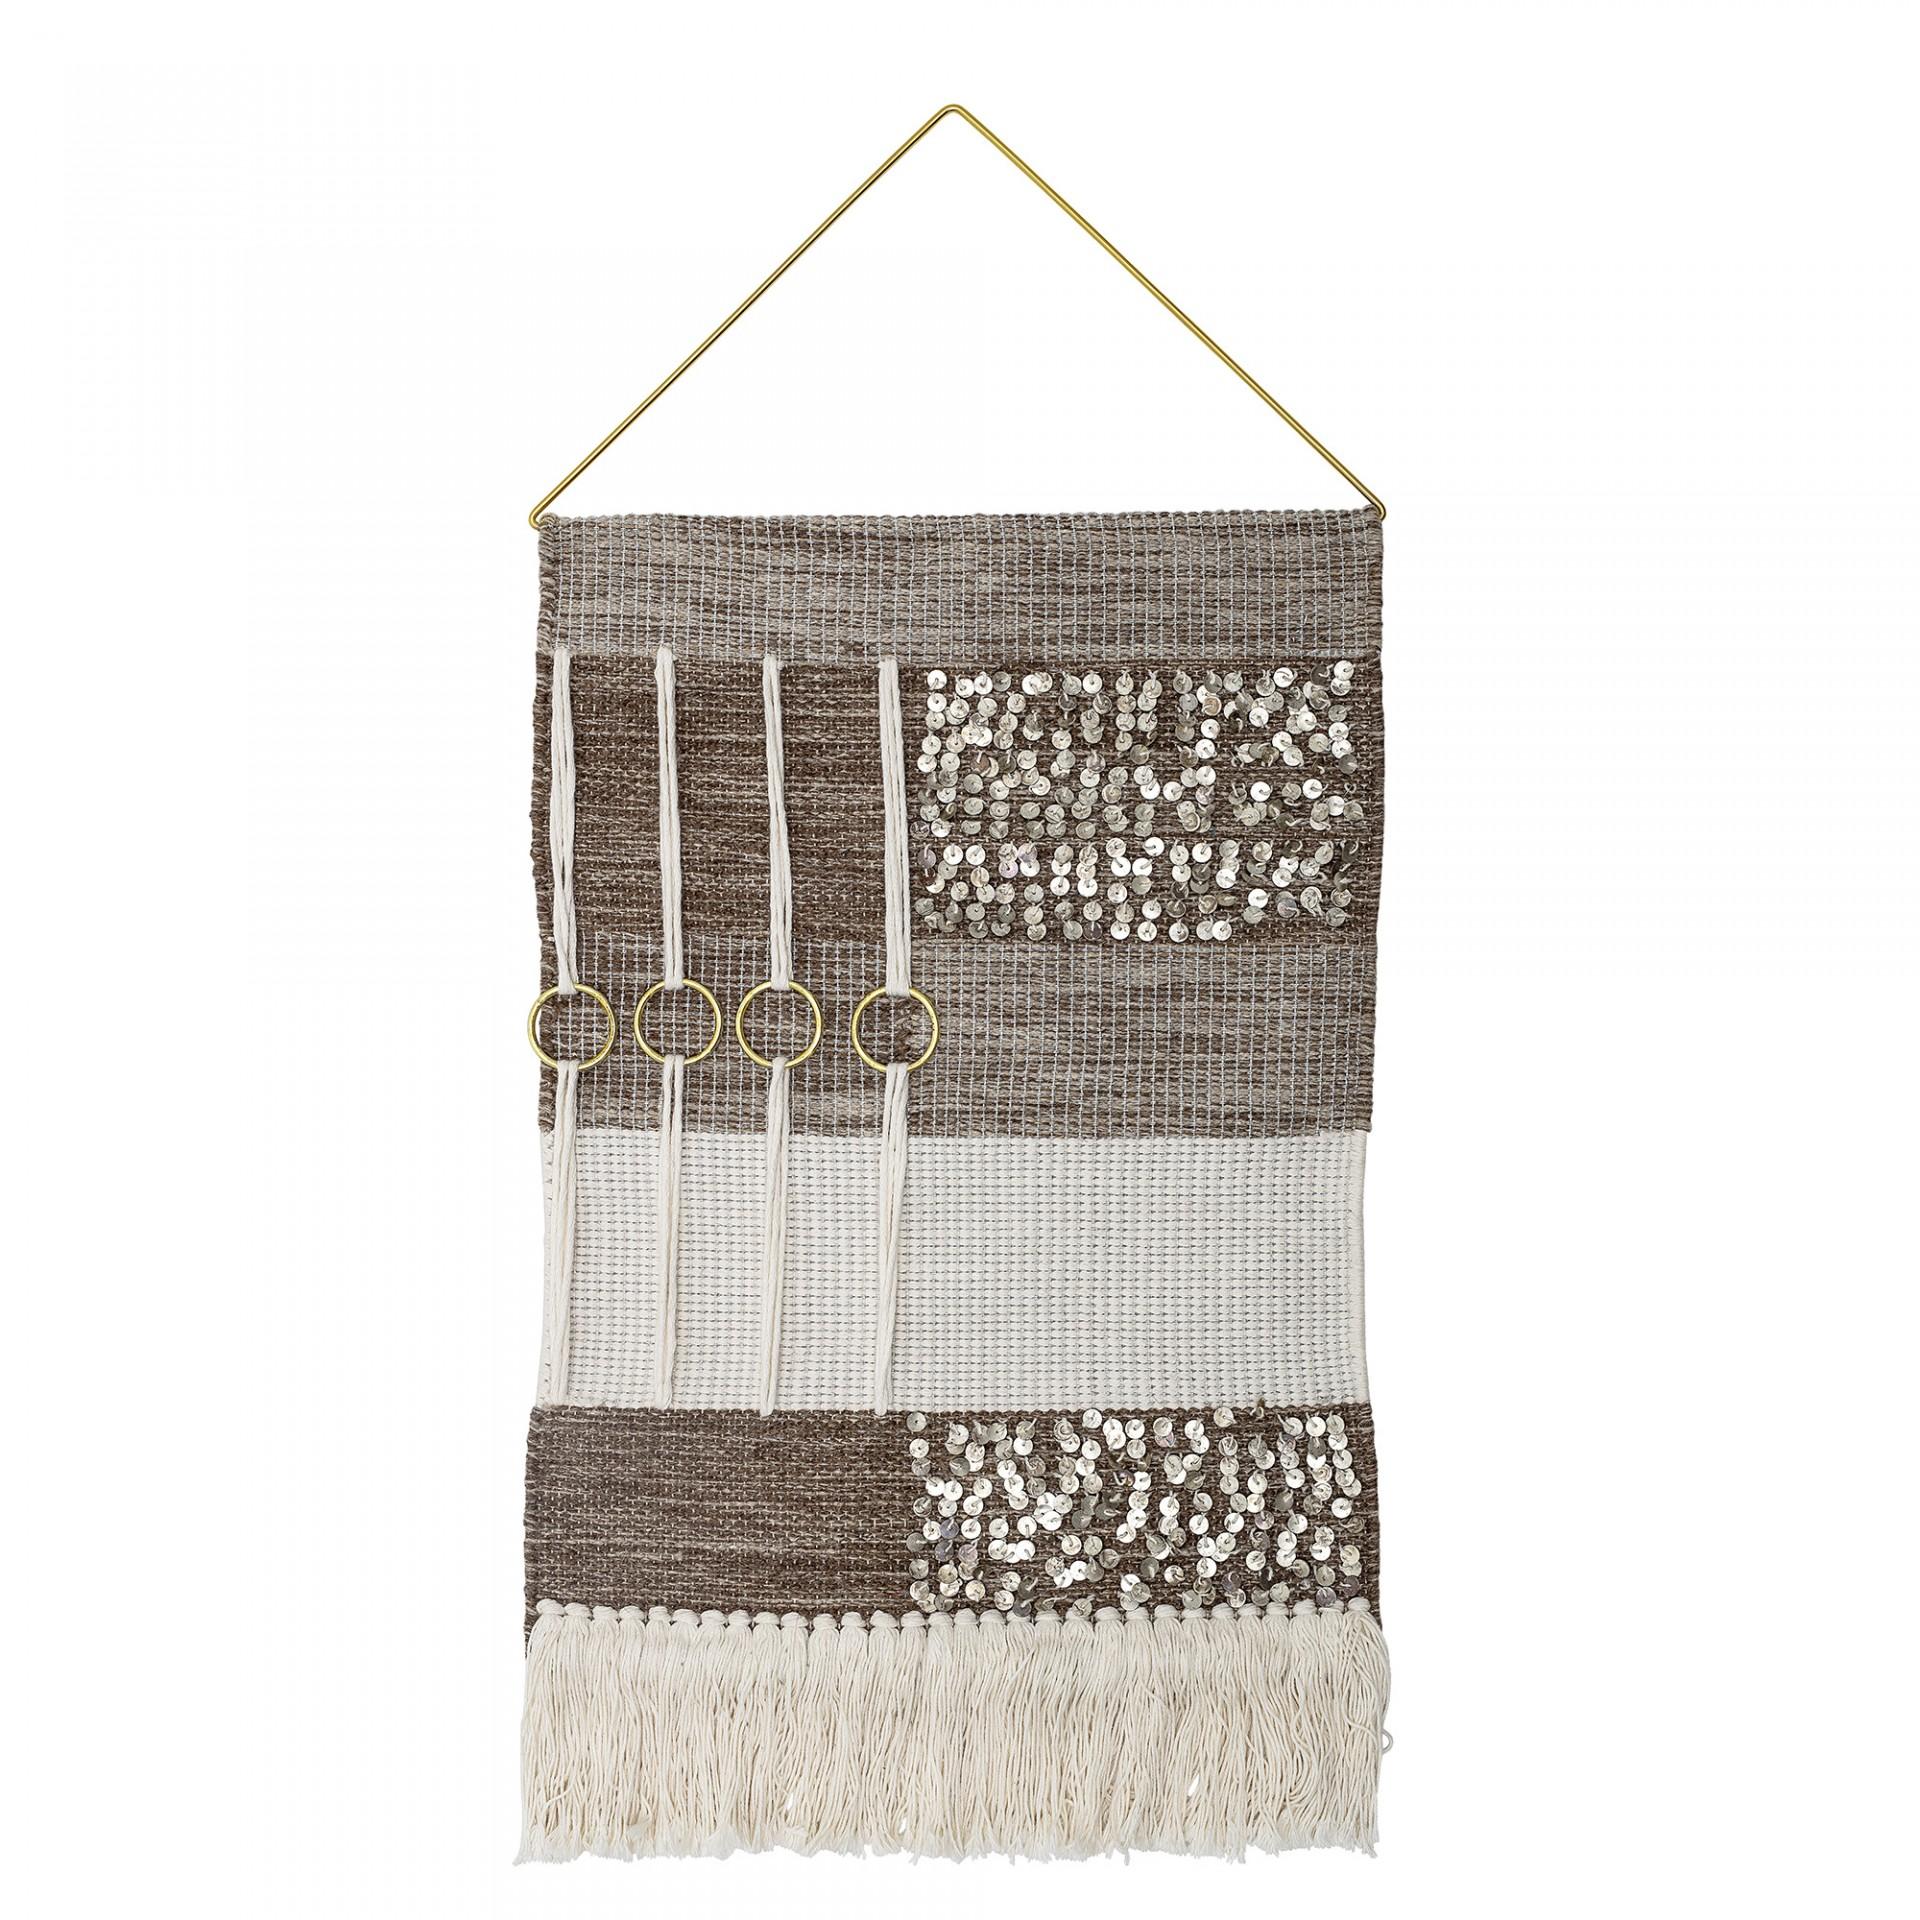 Macramé Woopi, lã/viscose, marron/branco, 71x36